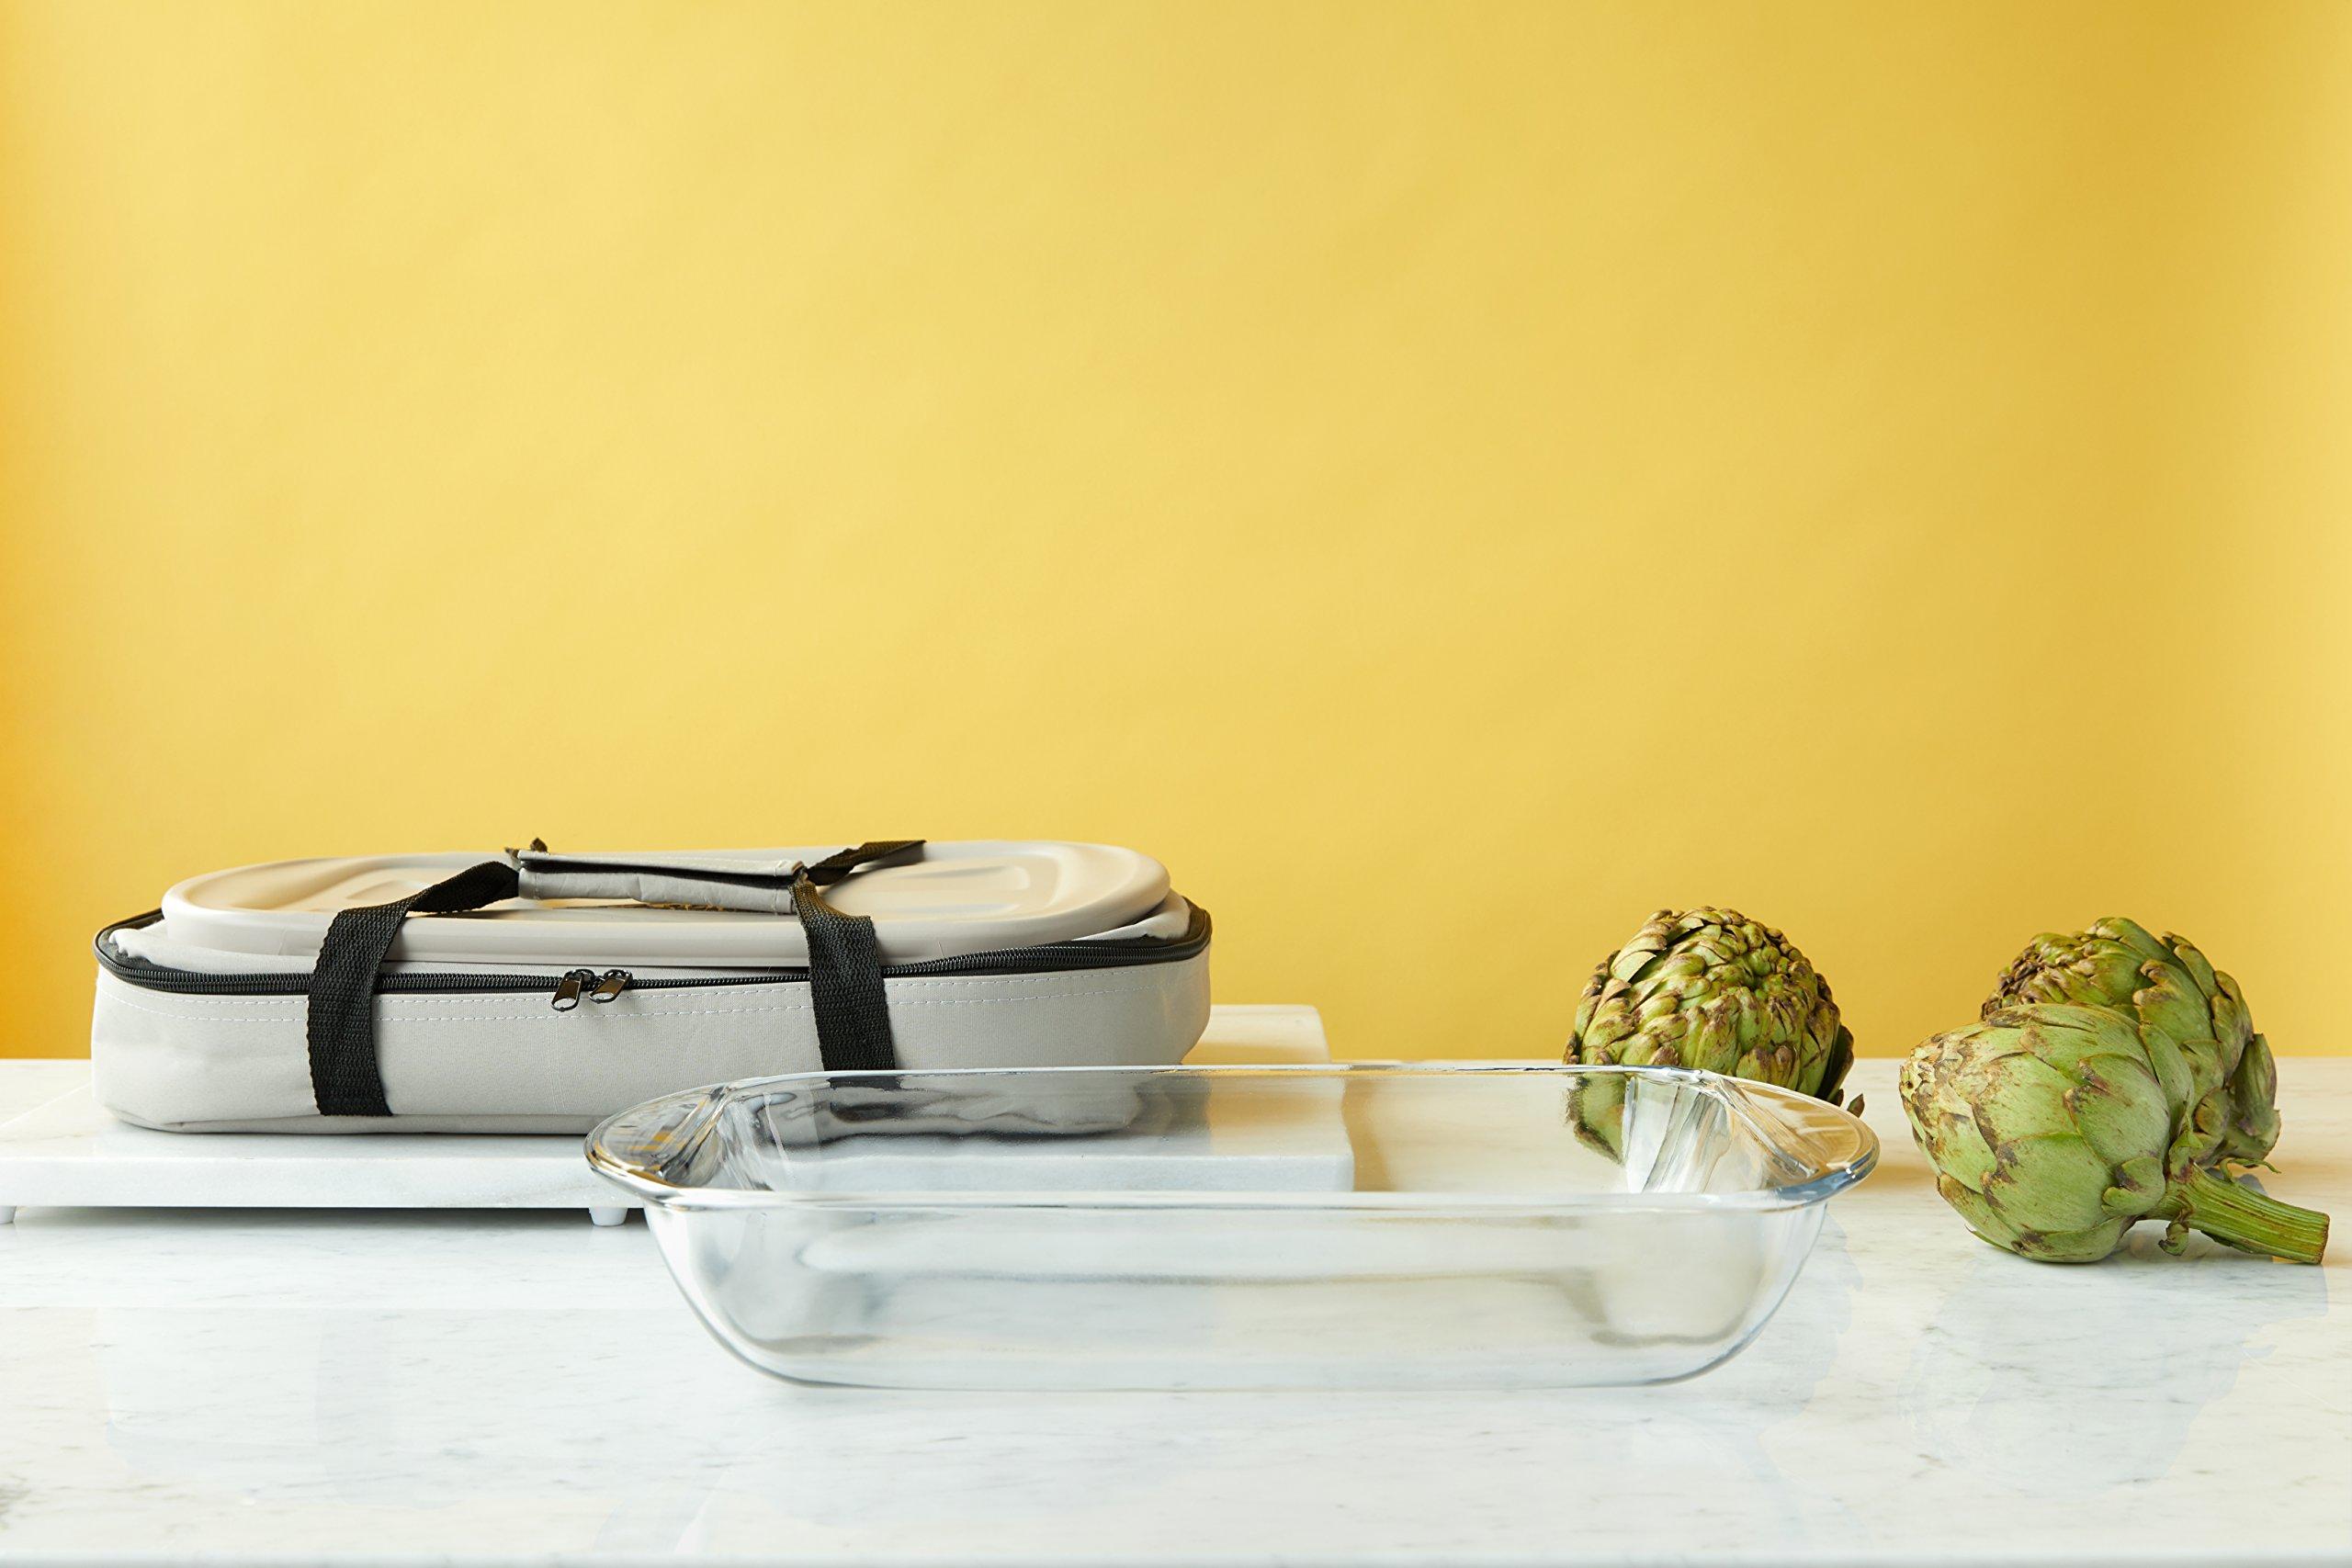 Anchor Hocking Oven Basics 4Piece Bake-N-Take Bakeware Set, Pepper Gray by Anchor Hocking (Image #6)